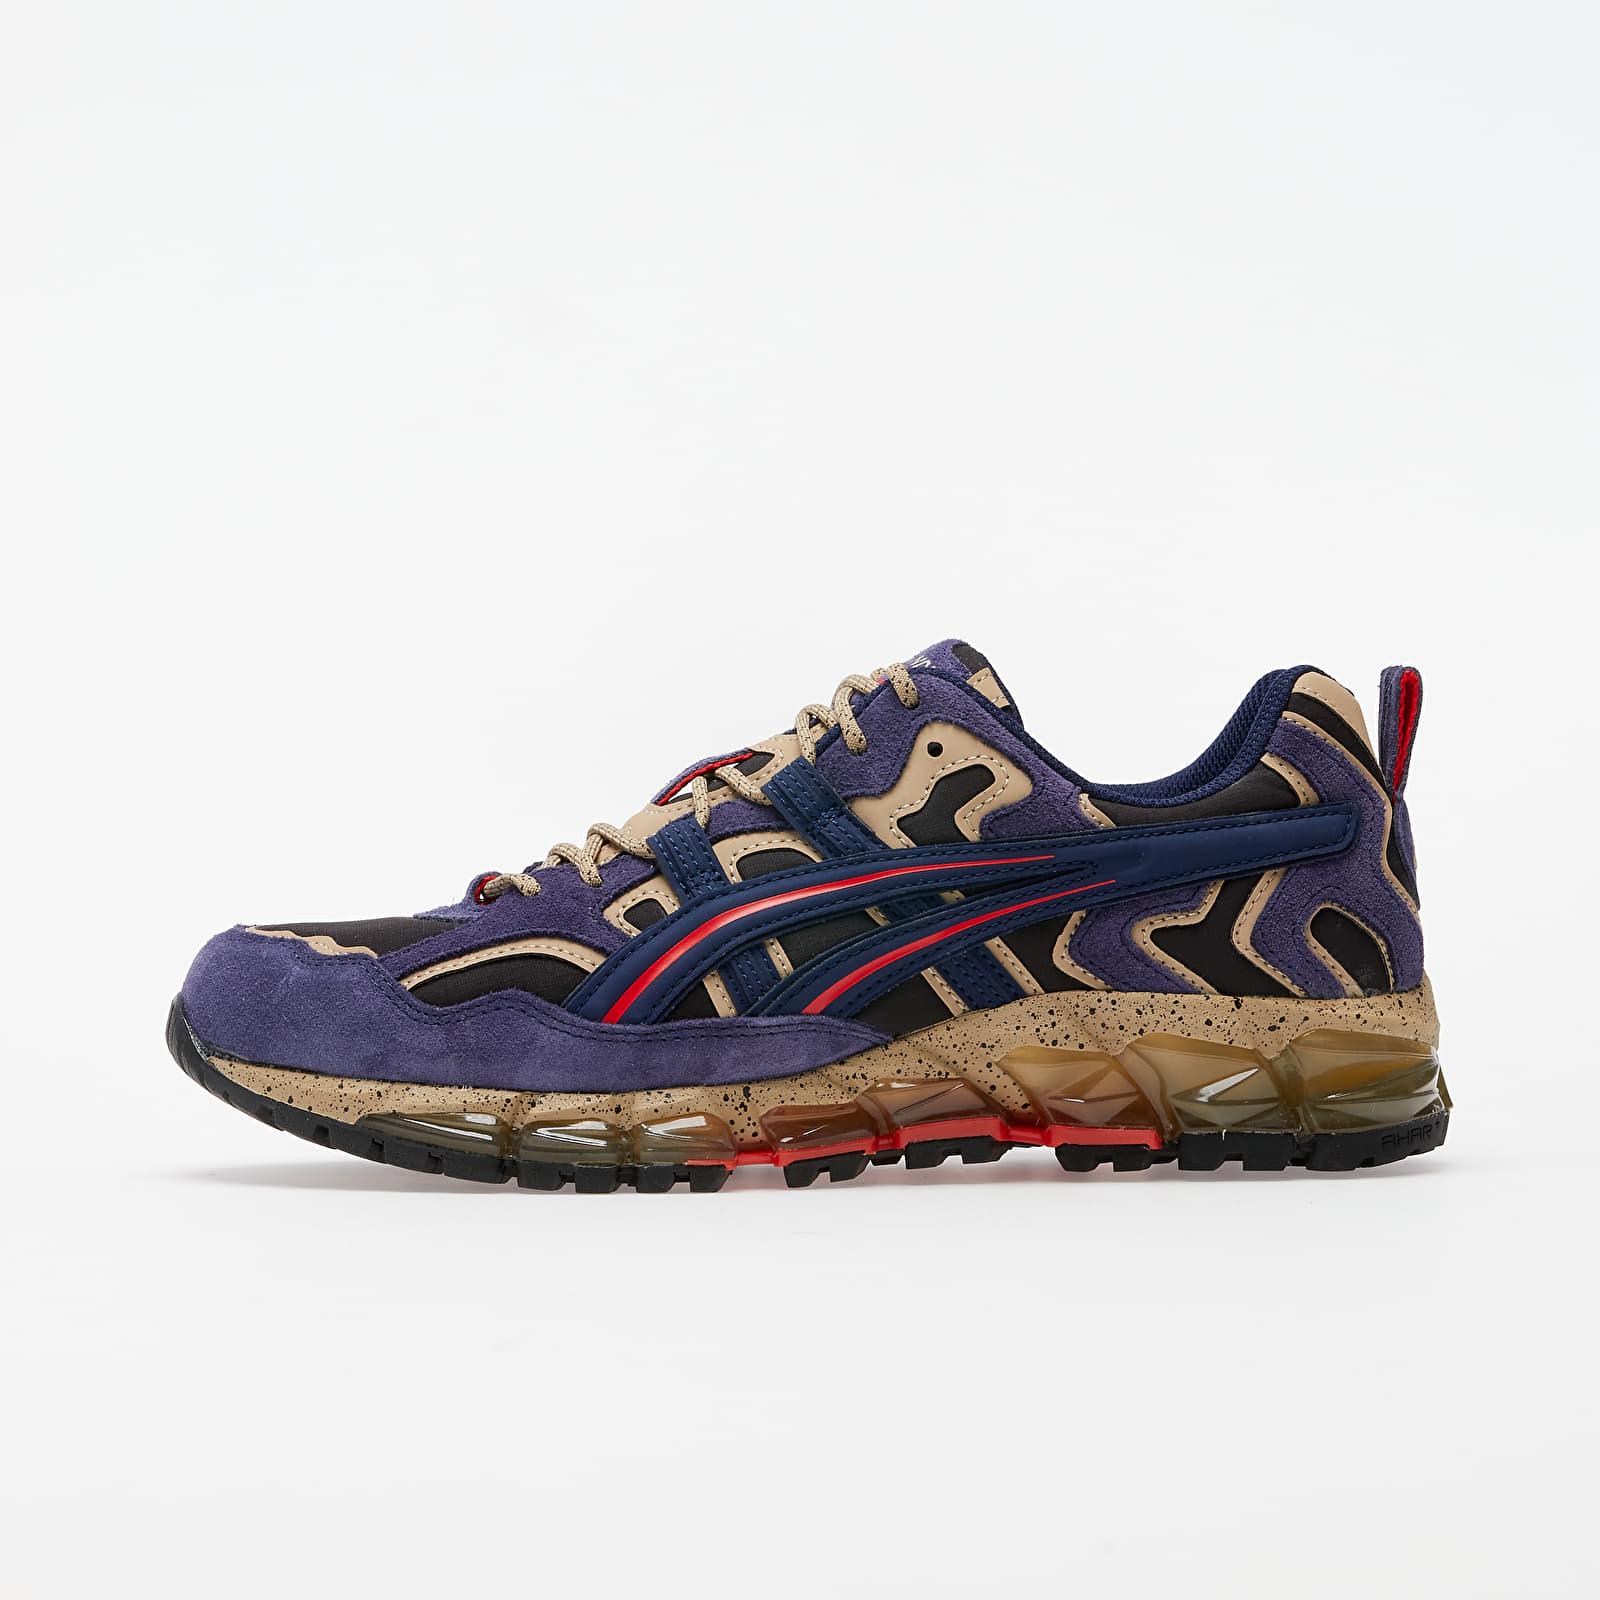 Men's shoes Asics Gel-Nandi 360 Black/ Peacoat